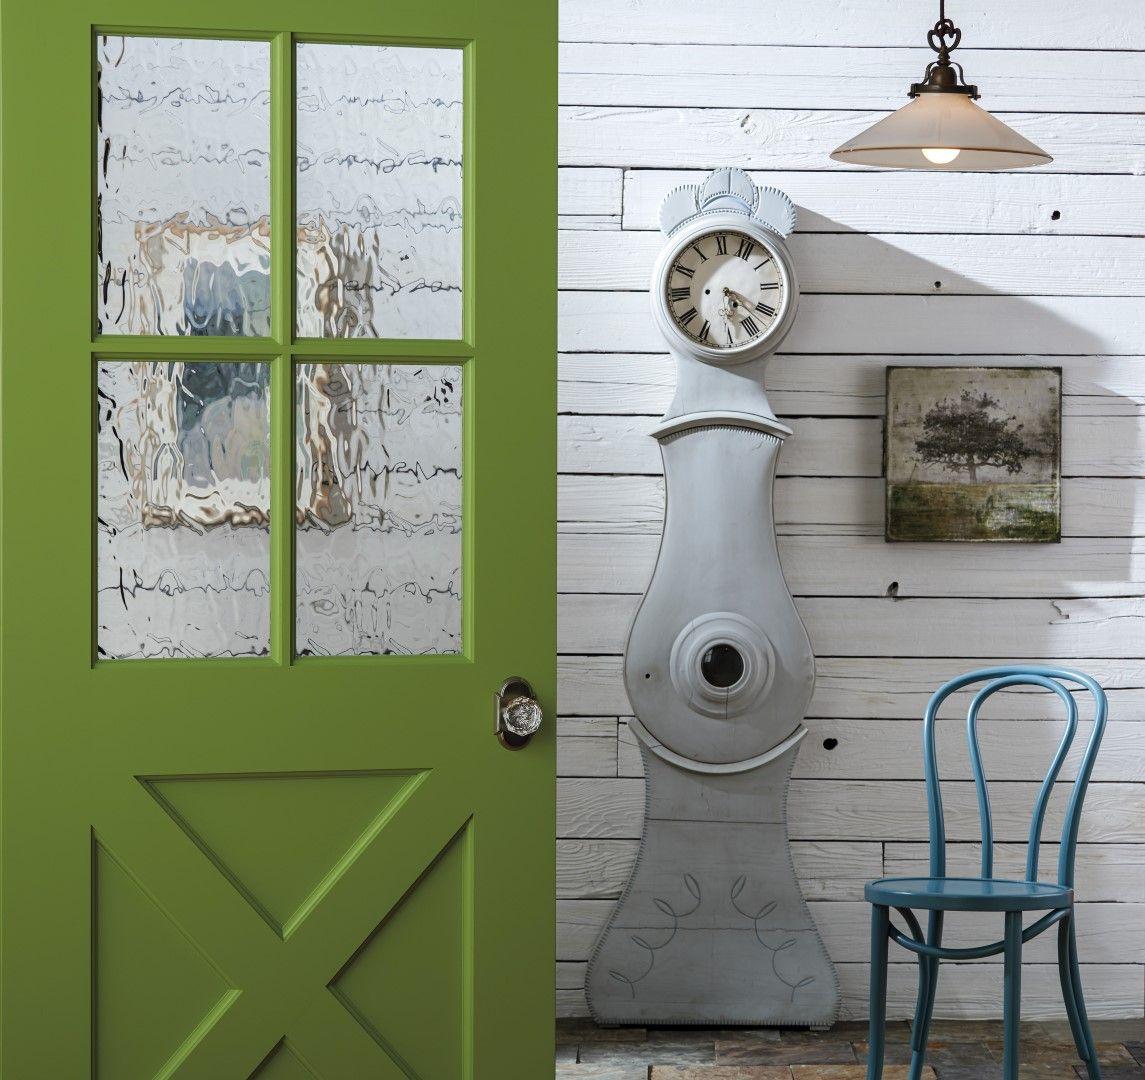 Mobile Home Cottage Door: TruStile Cottage Door Collection